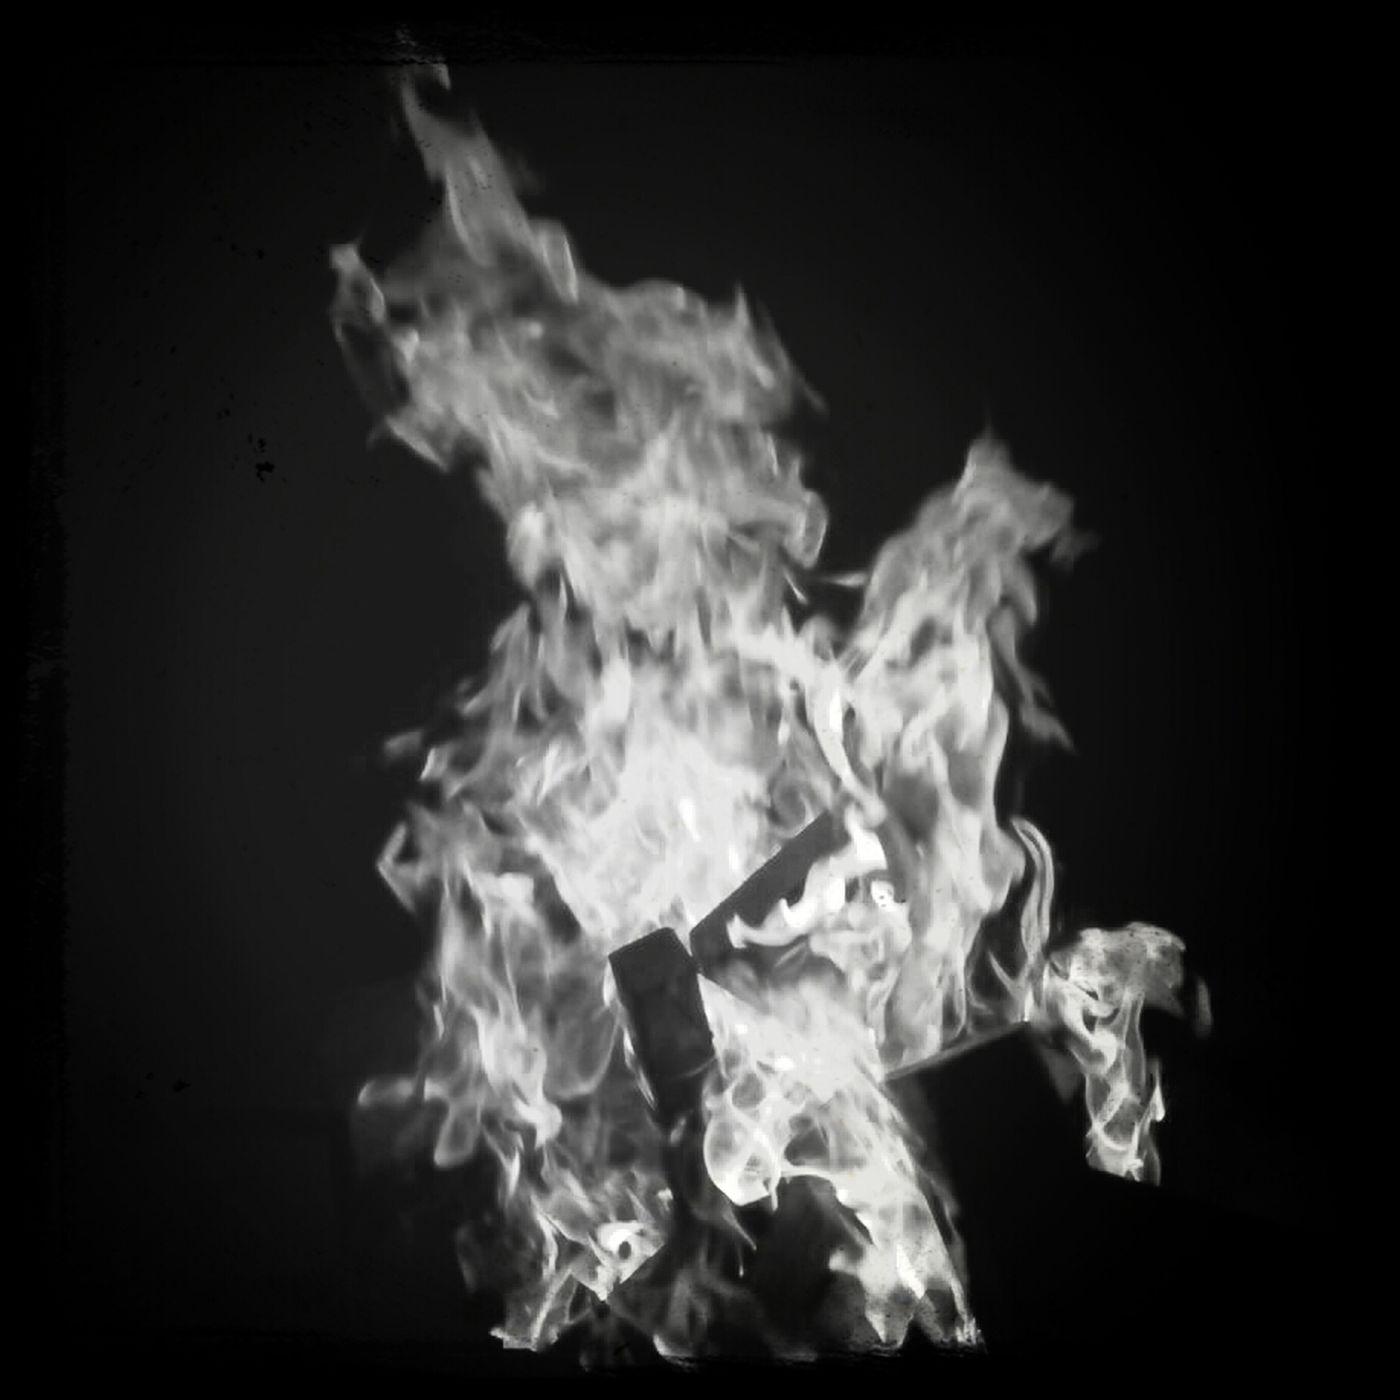 Fireoflife